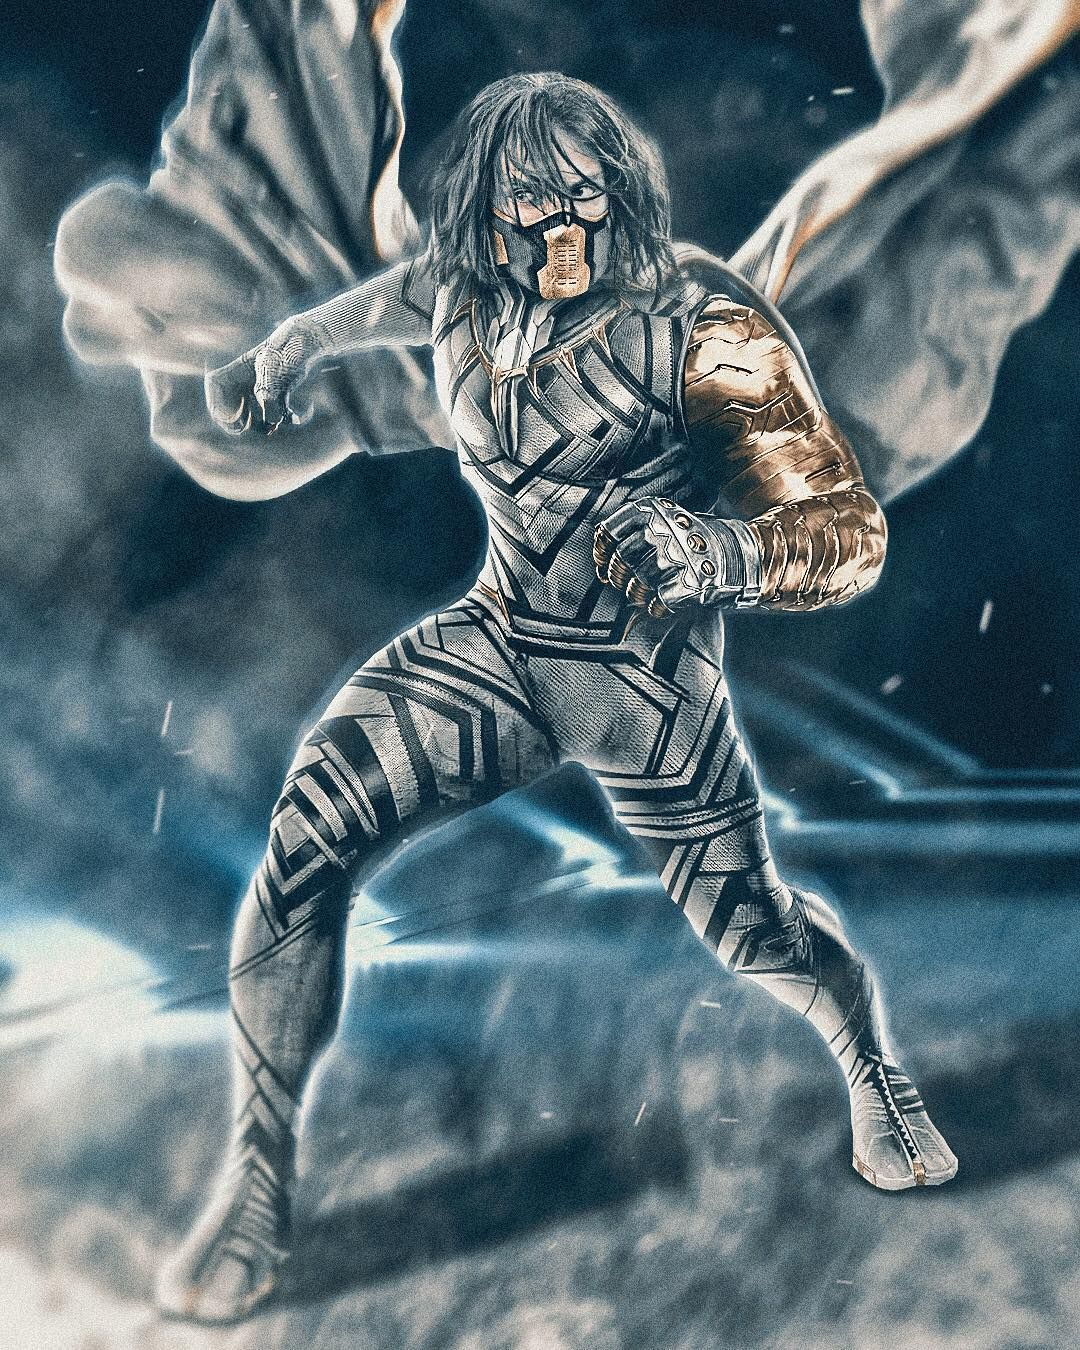 White Wolf x Bucky x Black Panther mashup | #vibranium